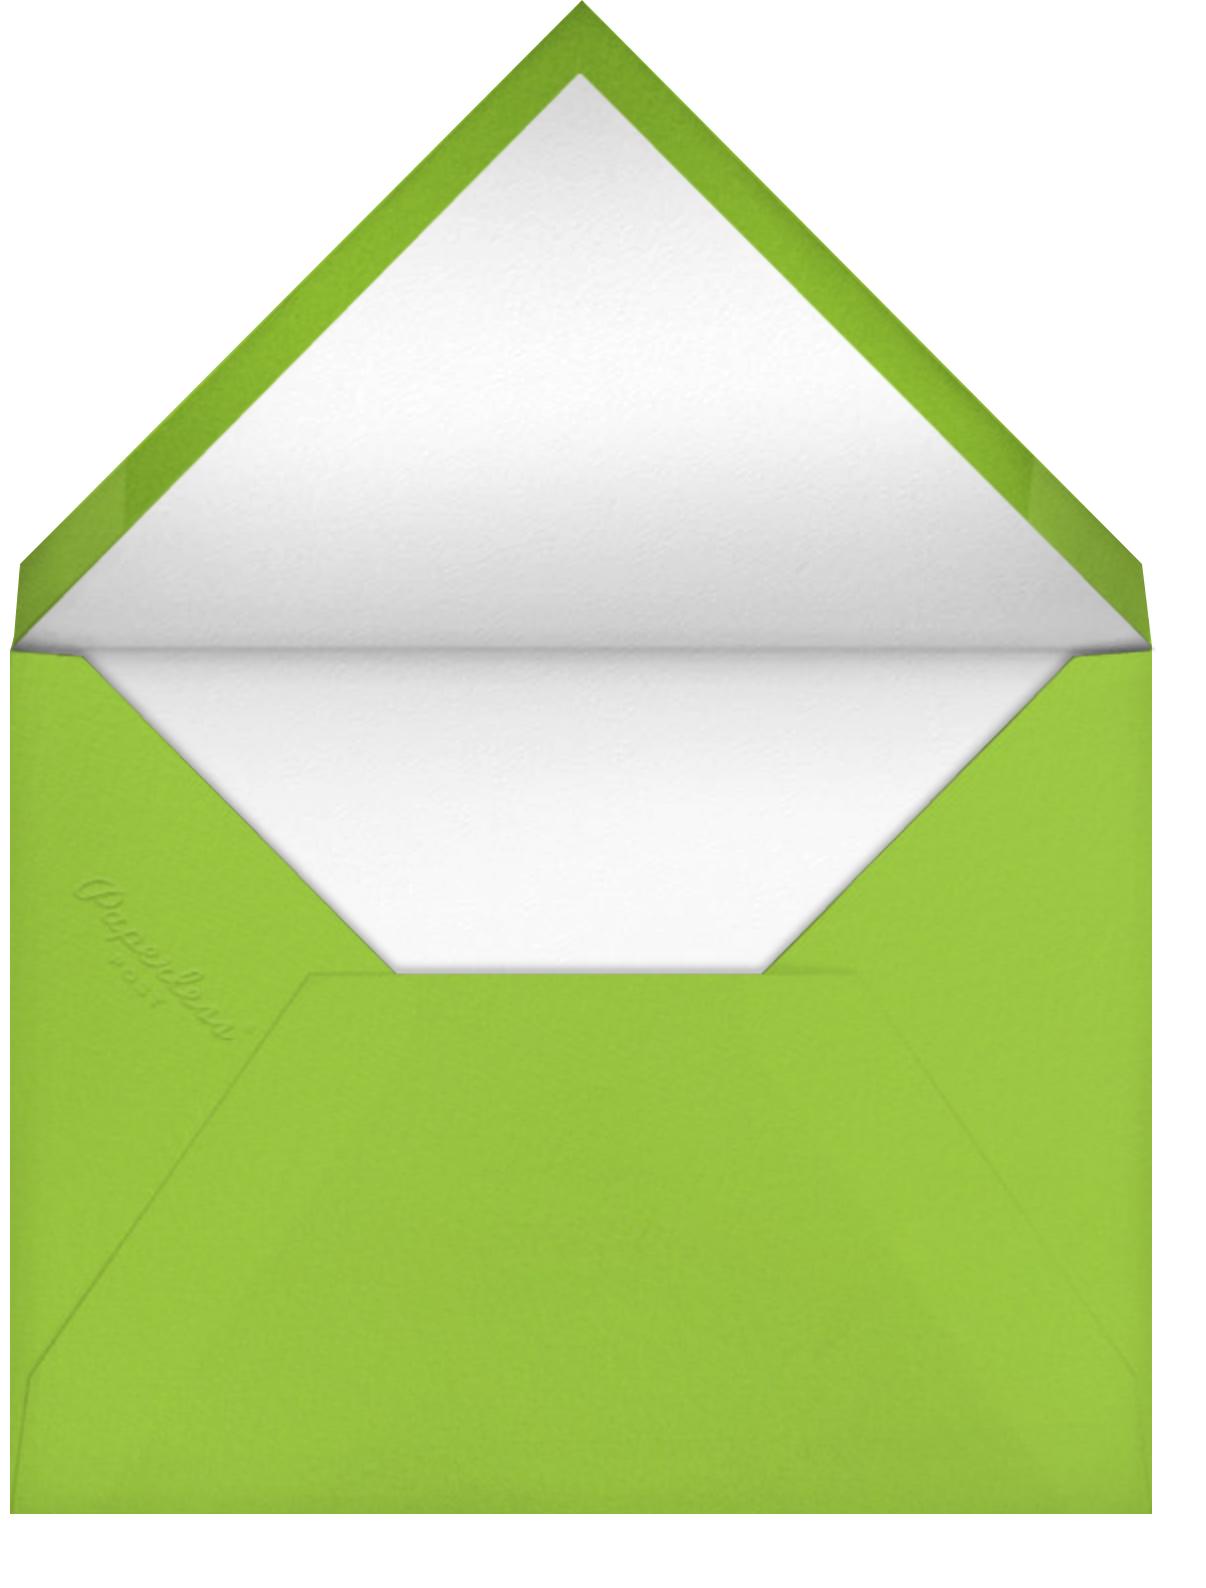 Boy Tree - Bernard Maisner - Envelope